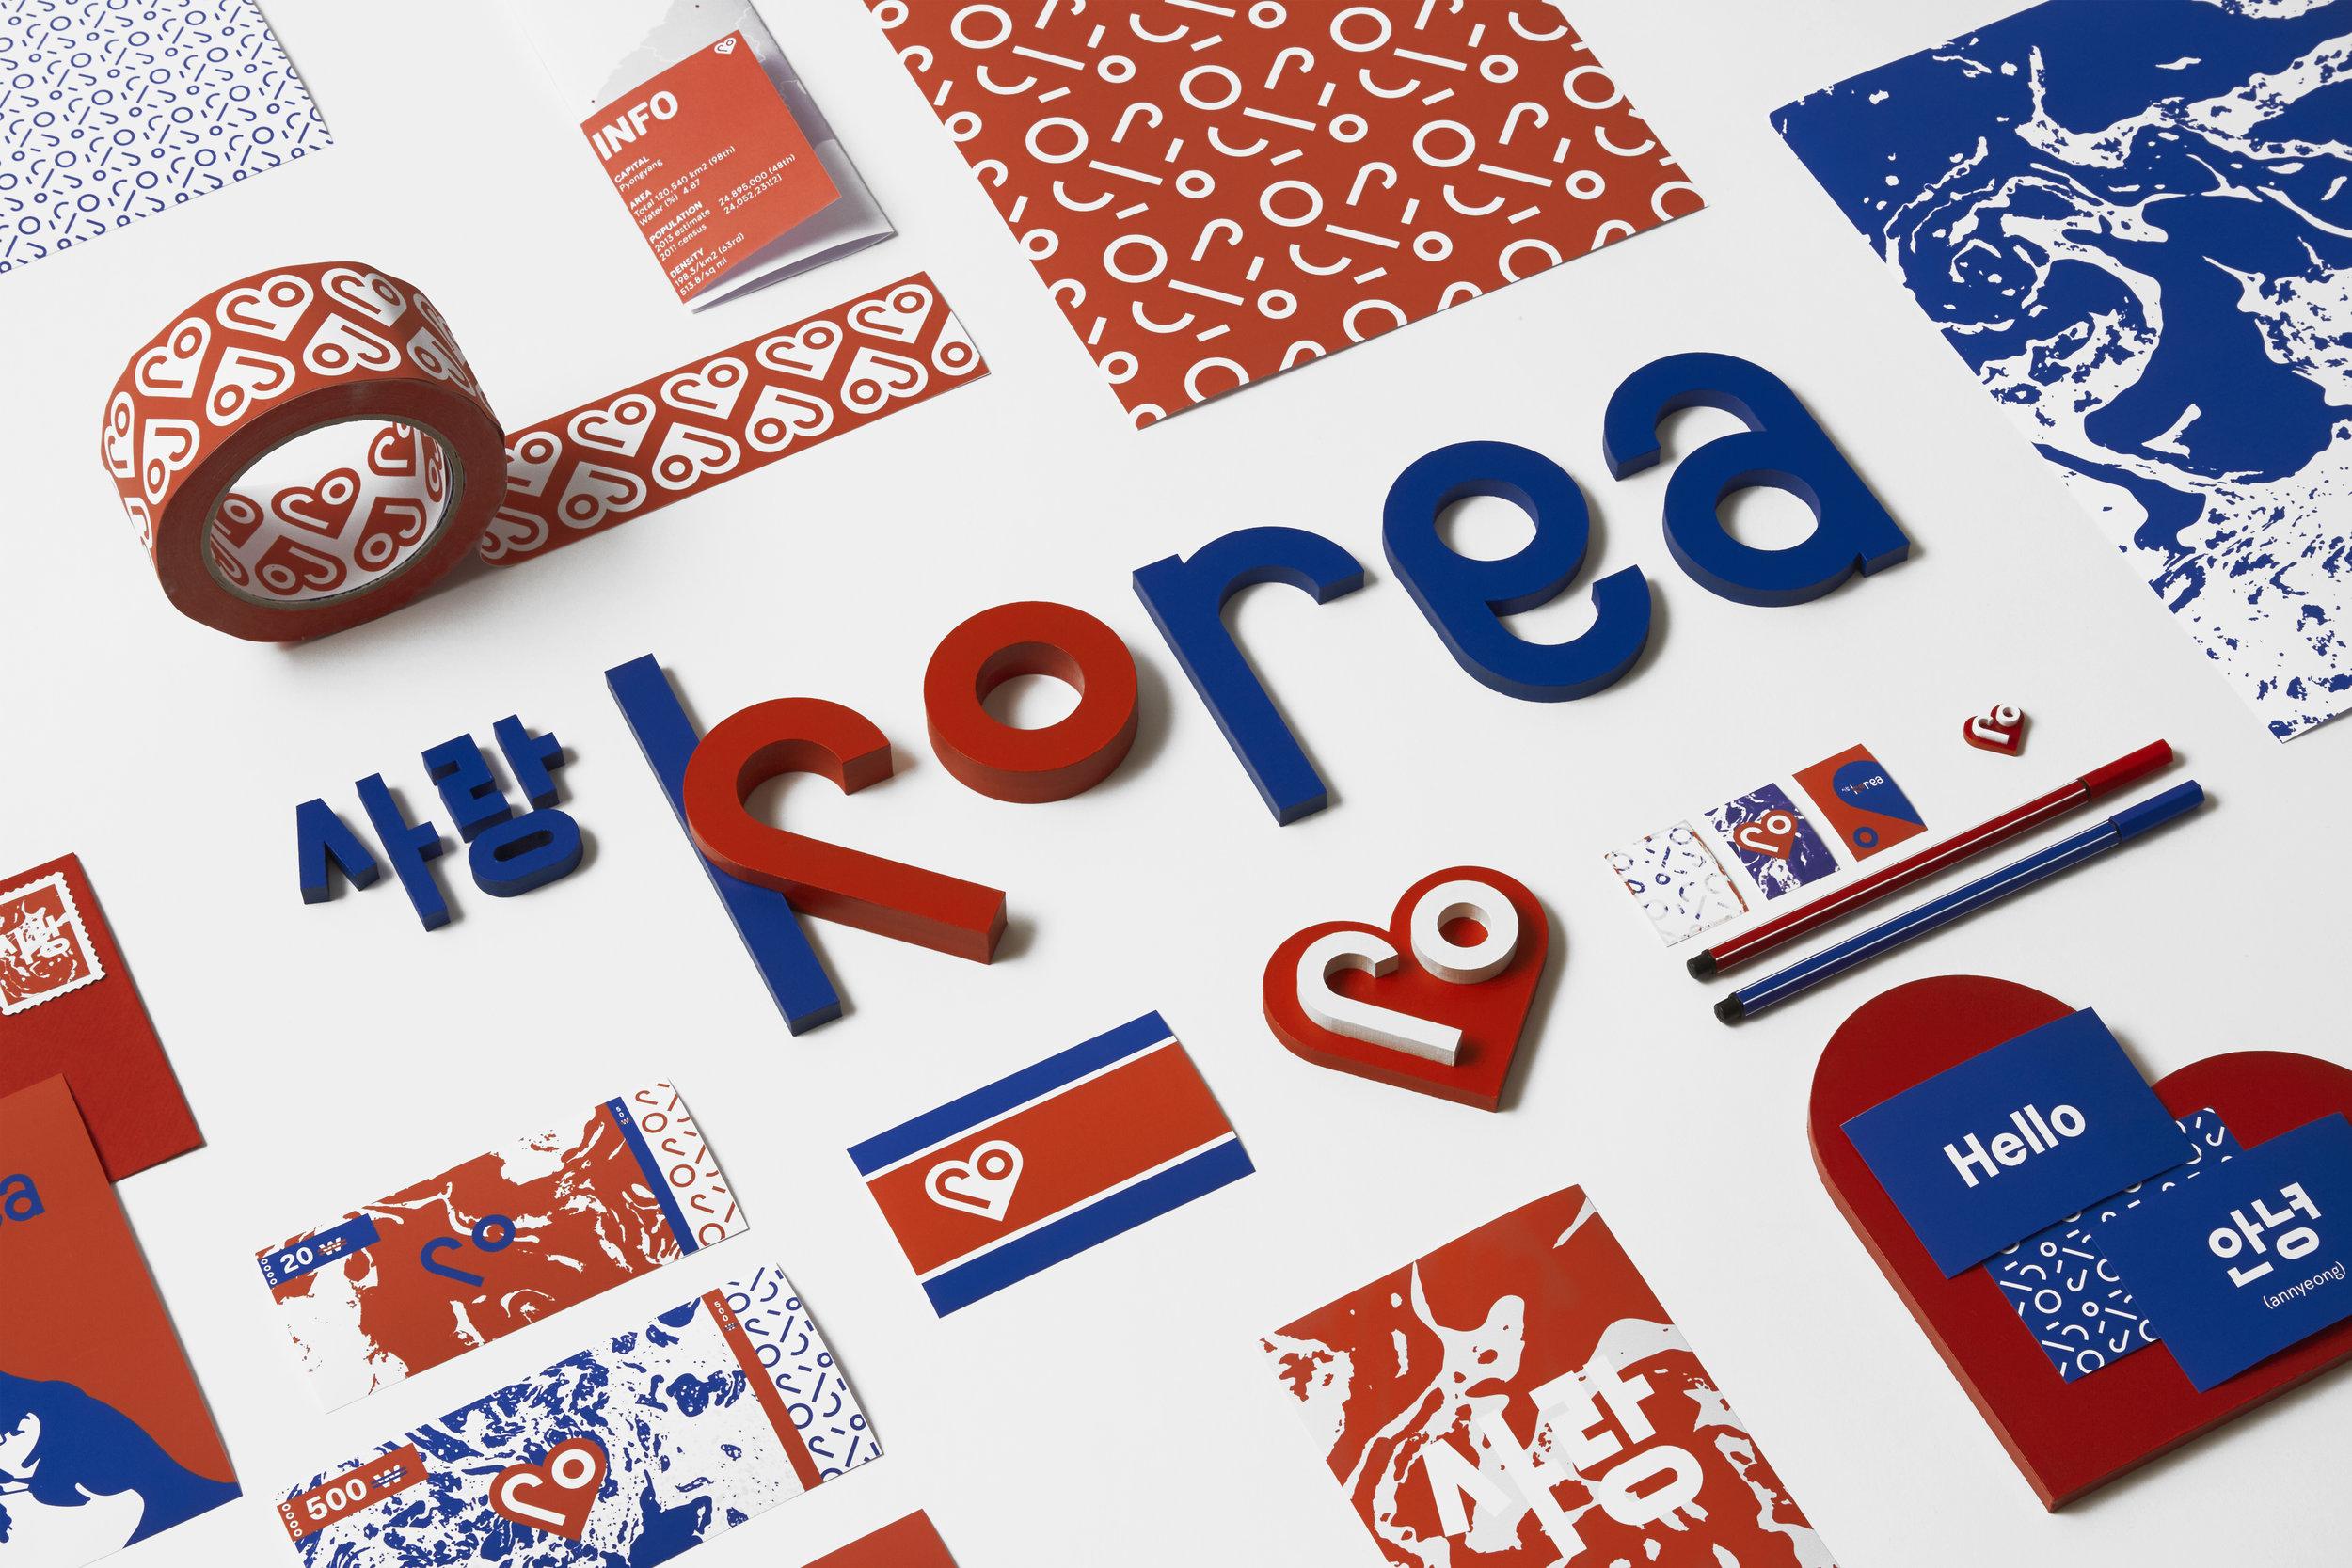 LOVE KOREA 4000x2667 16 ALL3.jpg